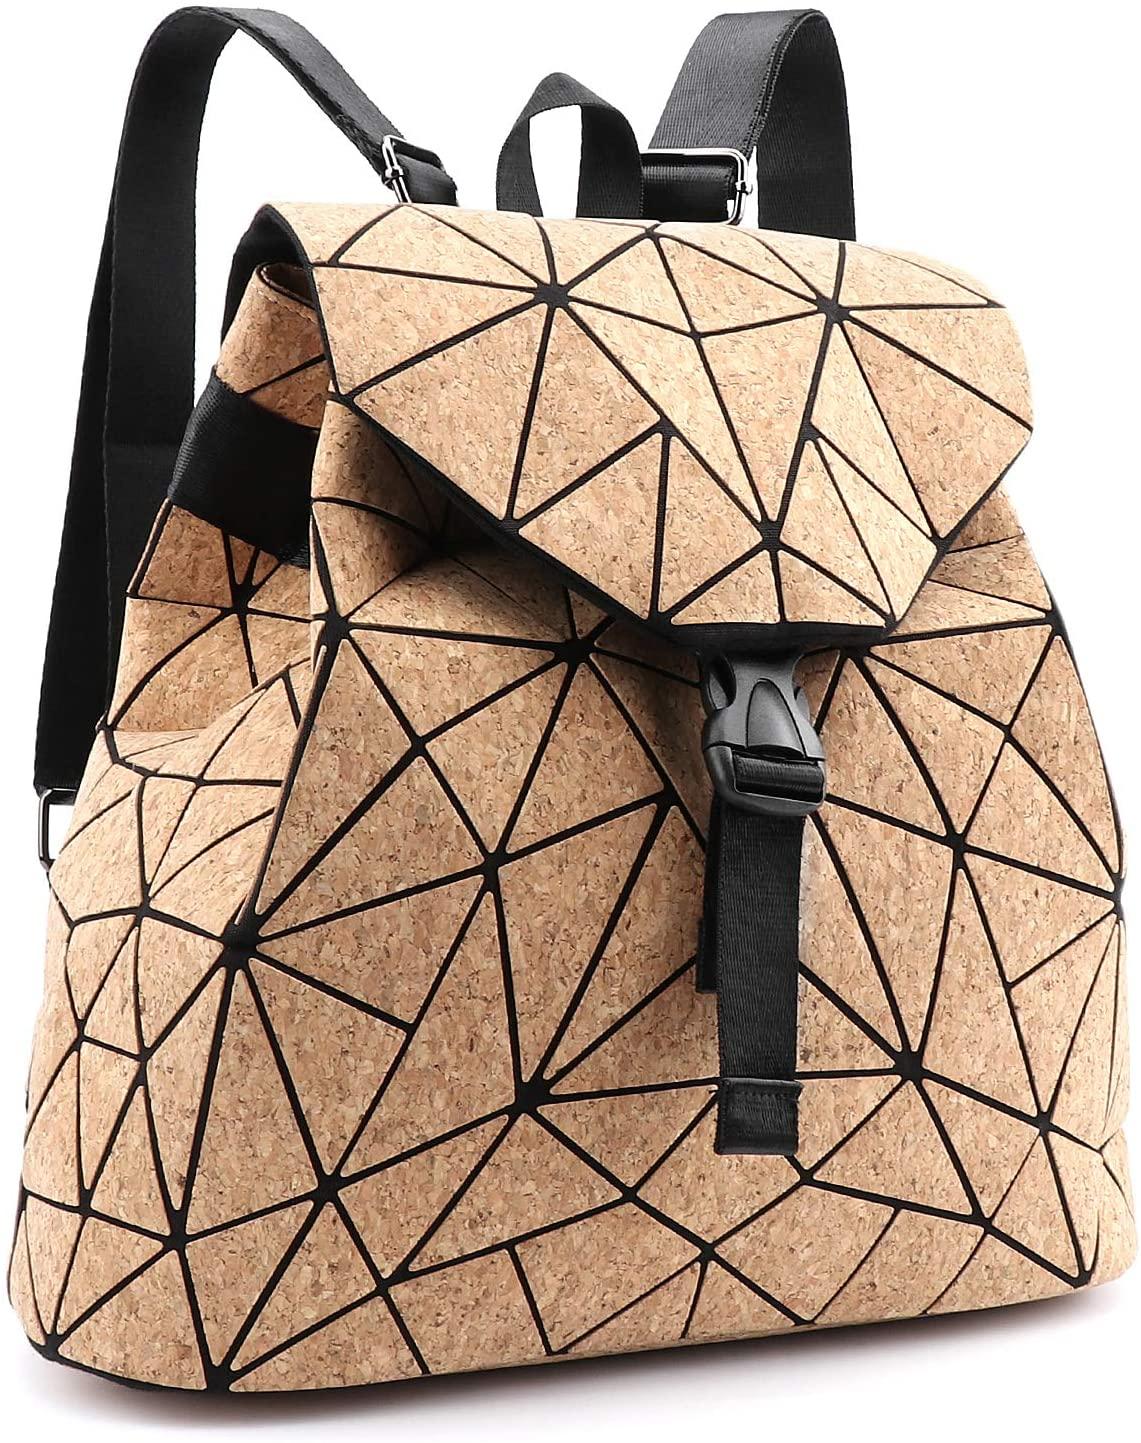 Tikea Geometric Backpack - Fashion Cork Schoolbag Causal Daypack Leather Rucksack Student Bookbag for Girl Women